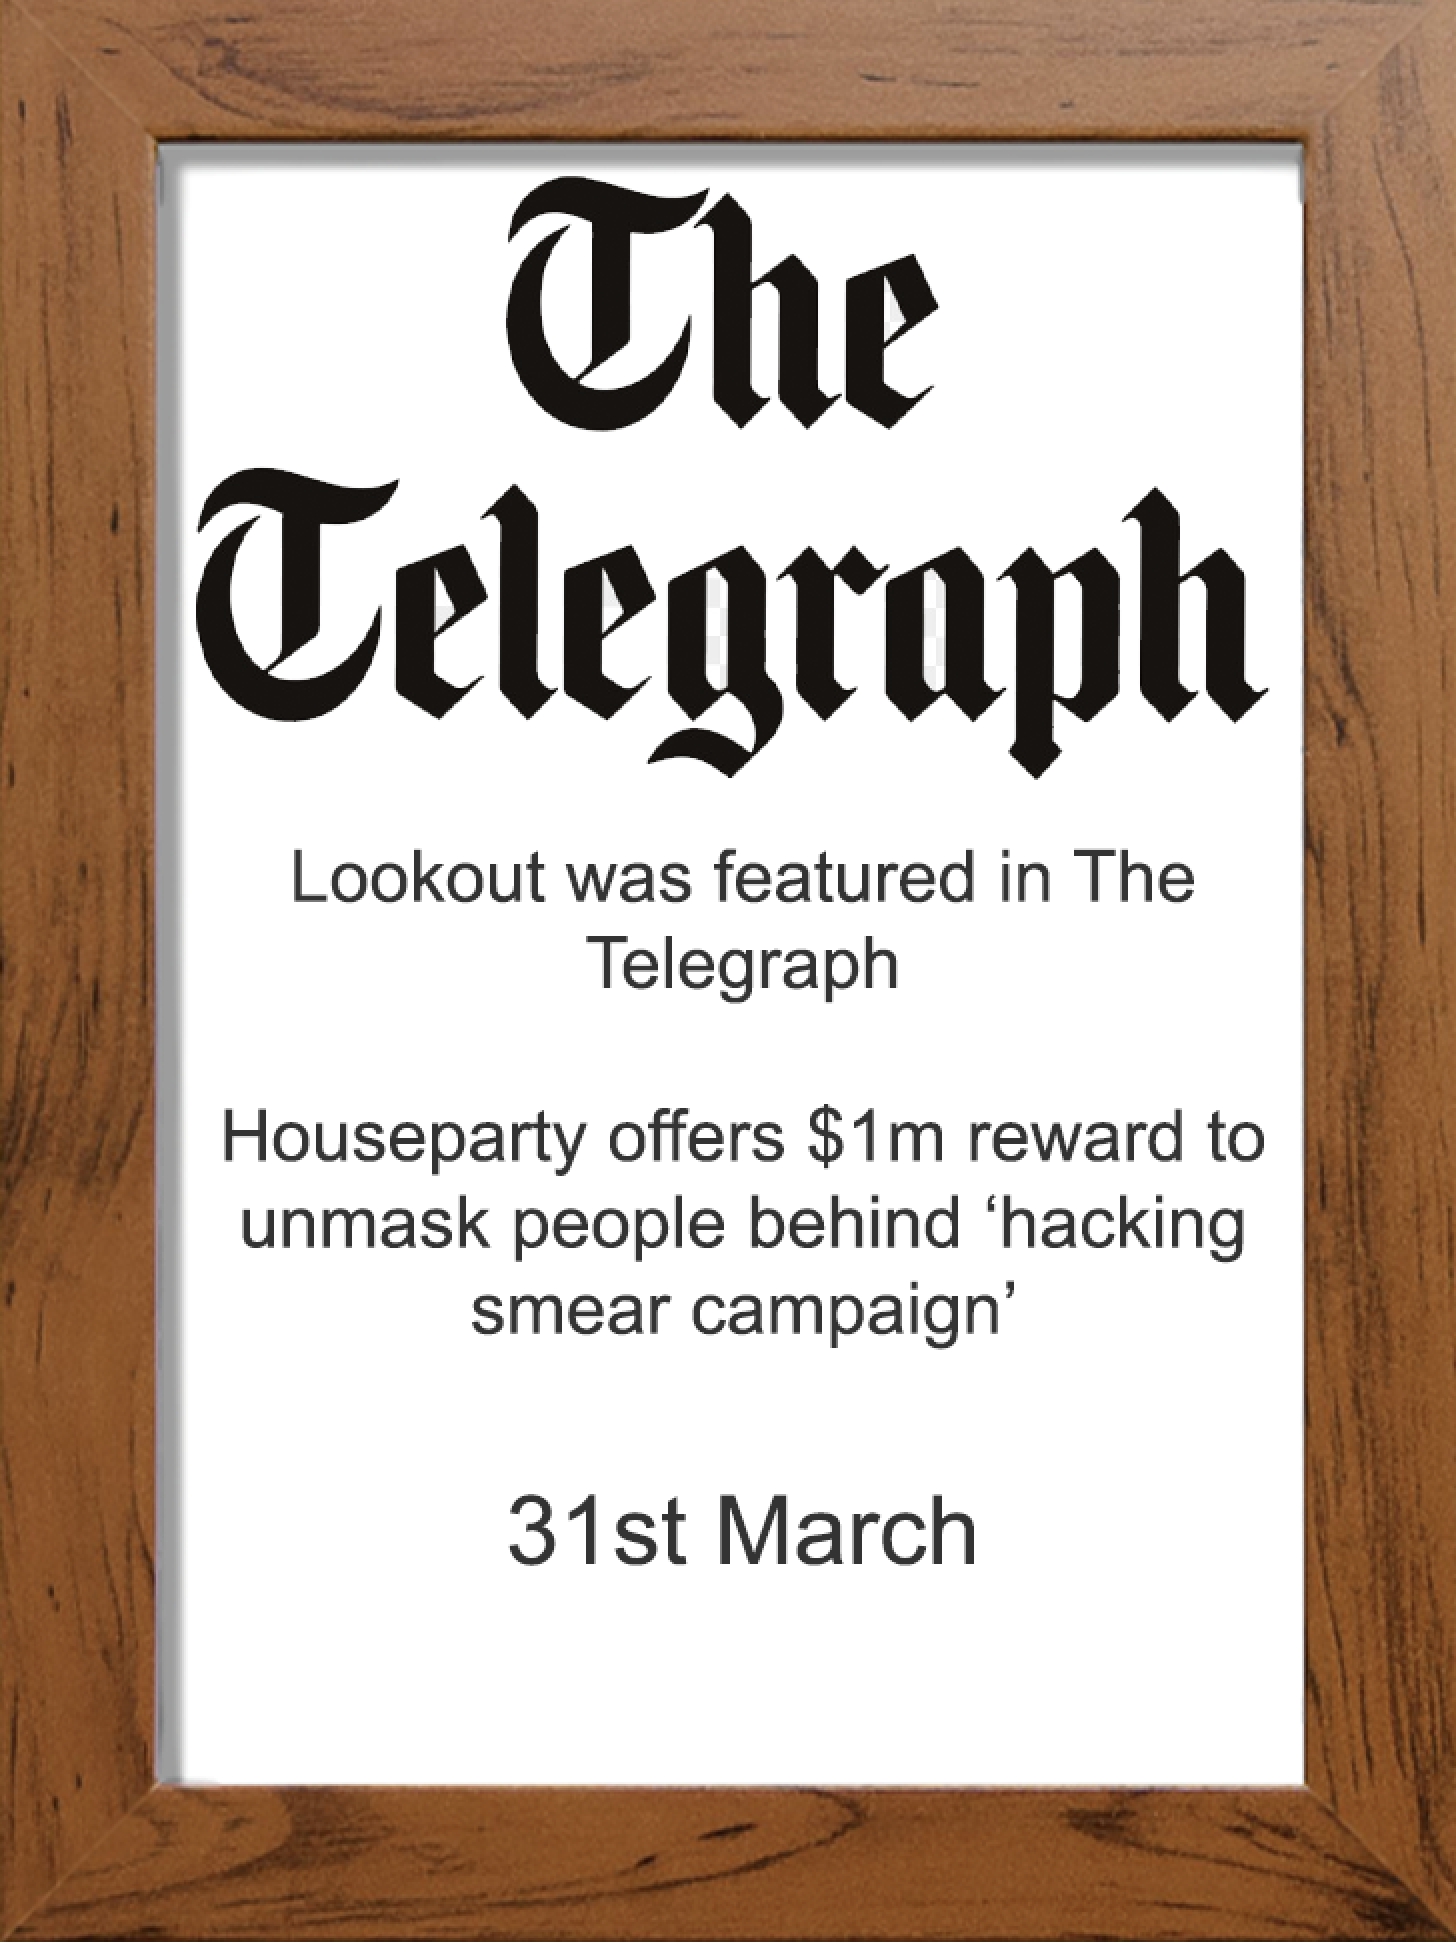 The Telegraph text